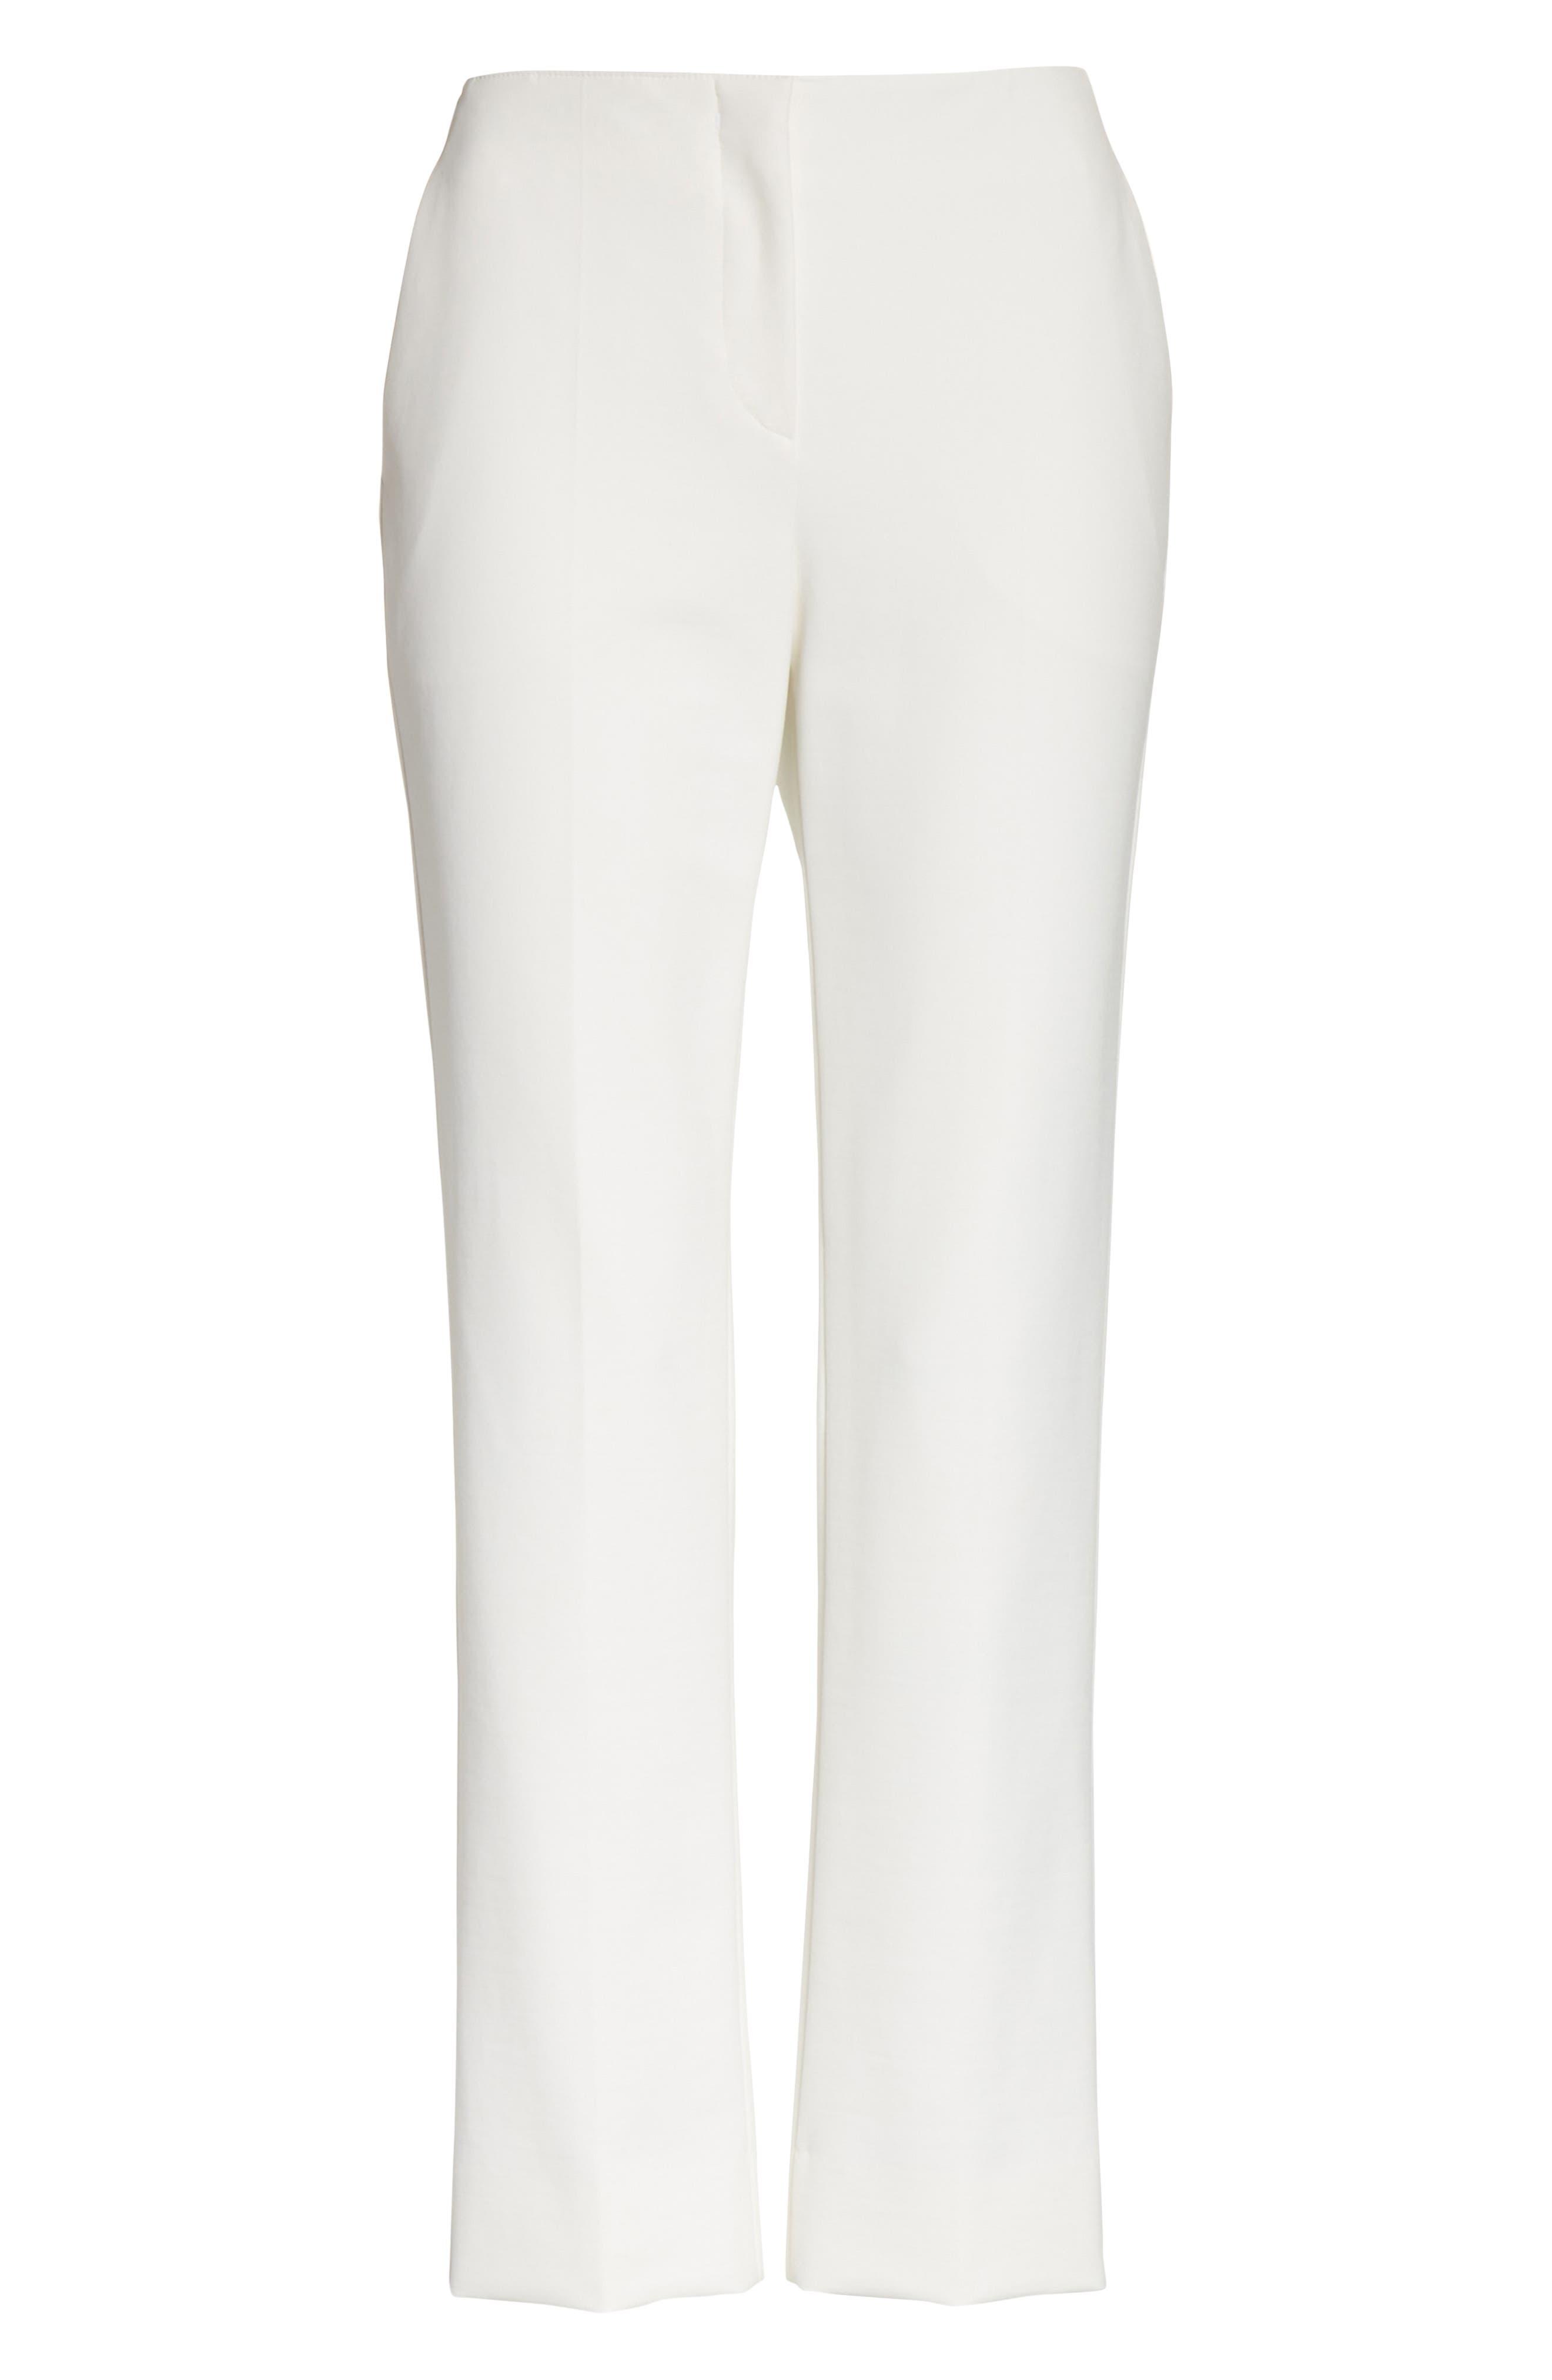 Tech Cotton Blend Pants,                             Alternate thumbnail 6, color,                             Warm White